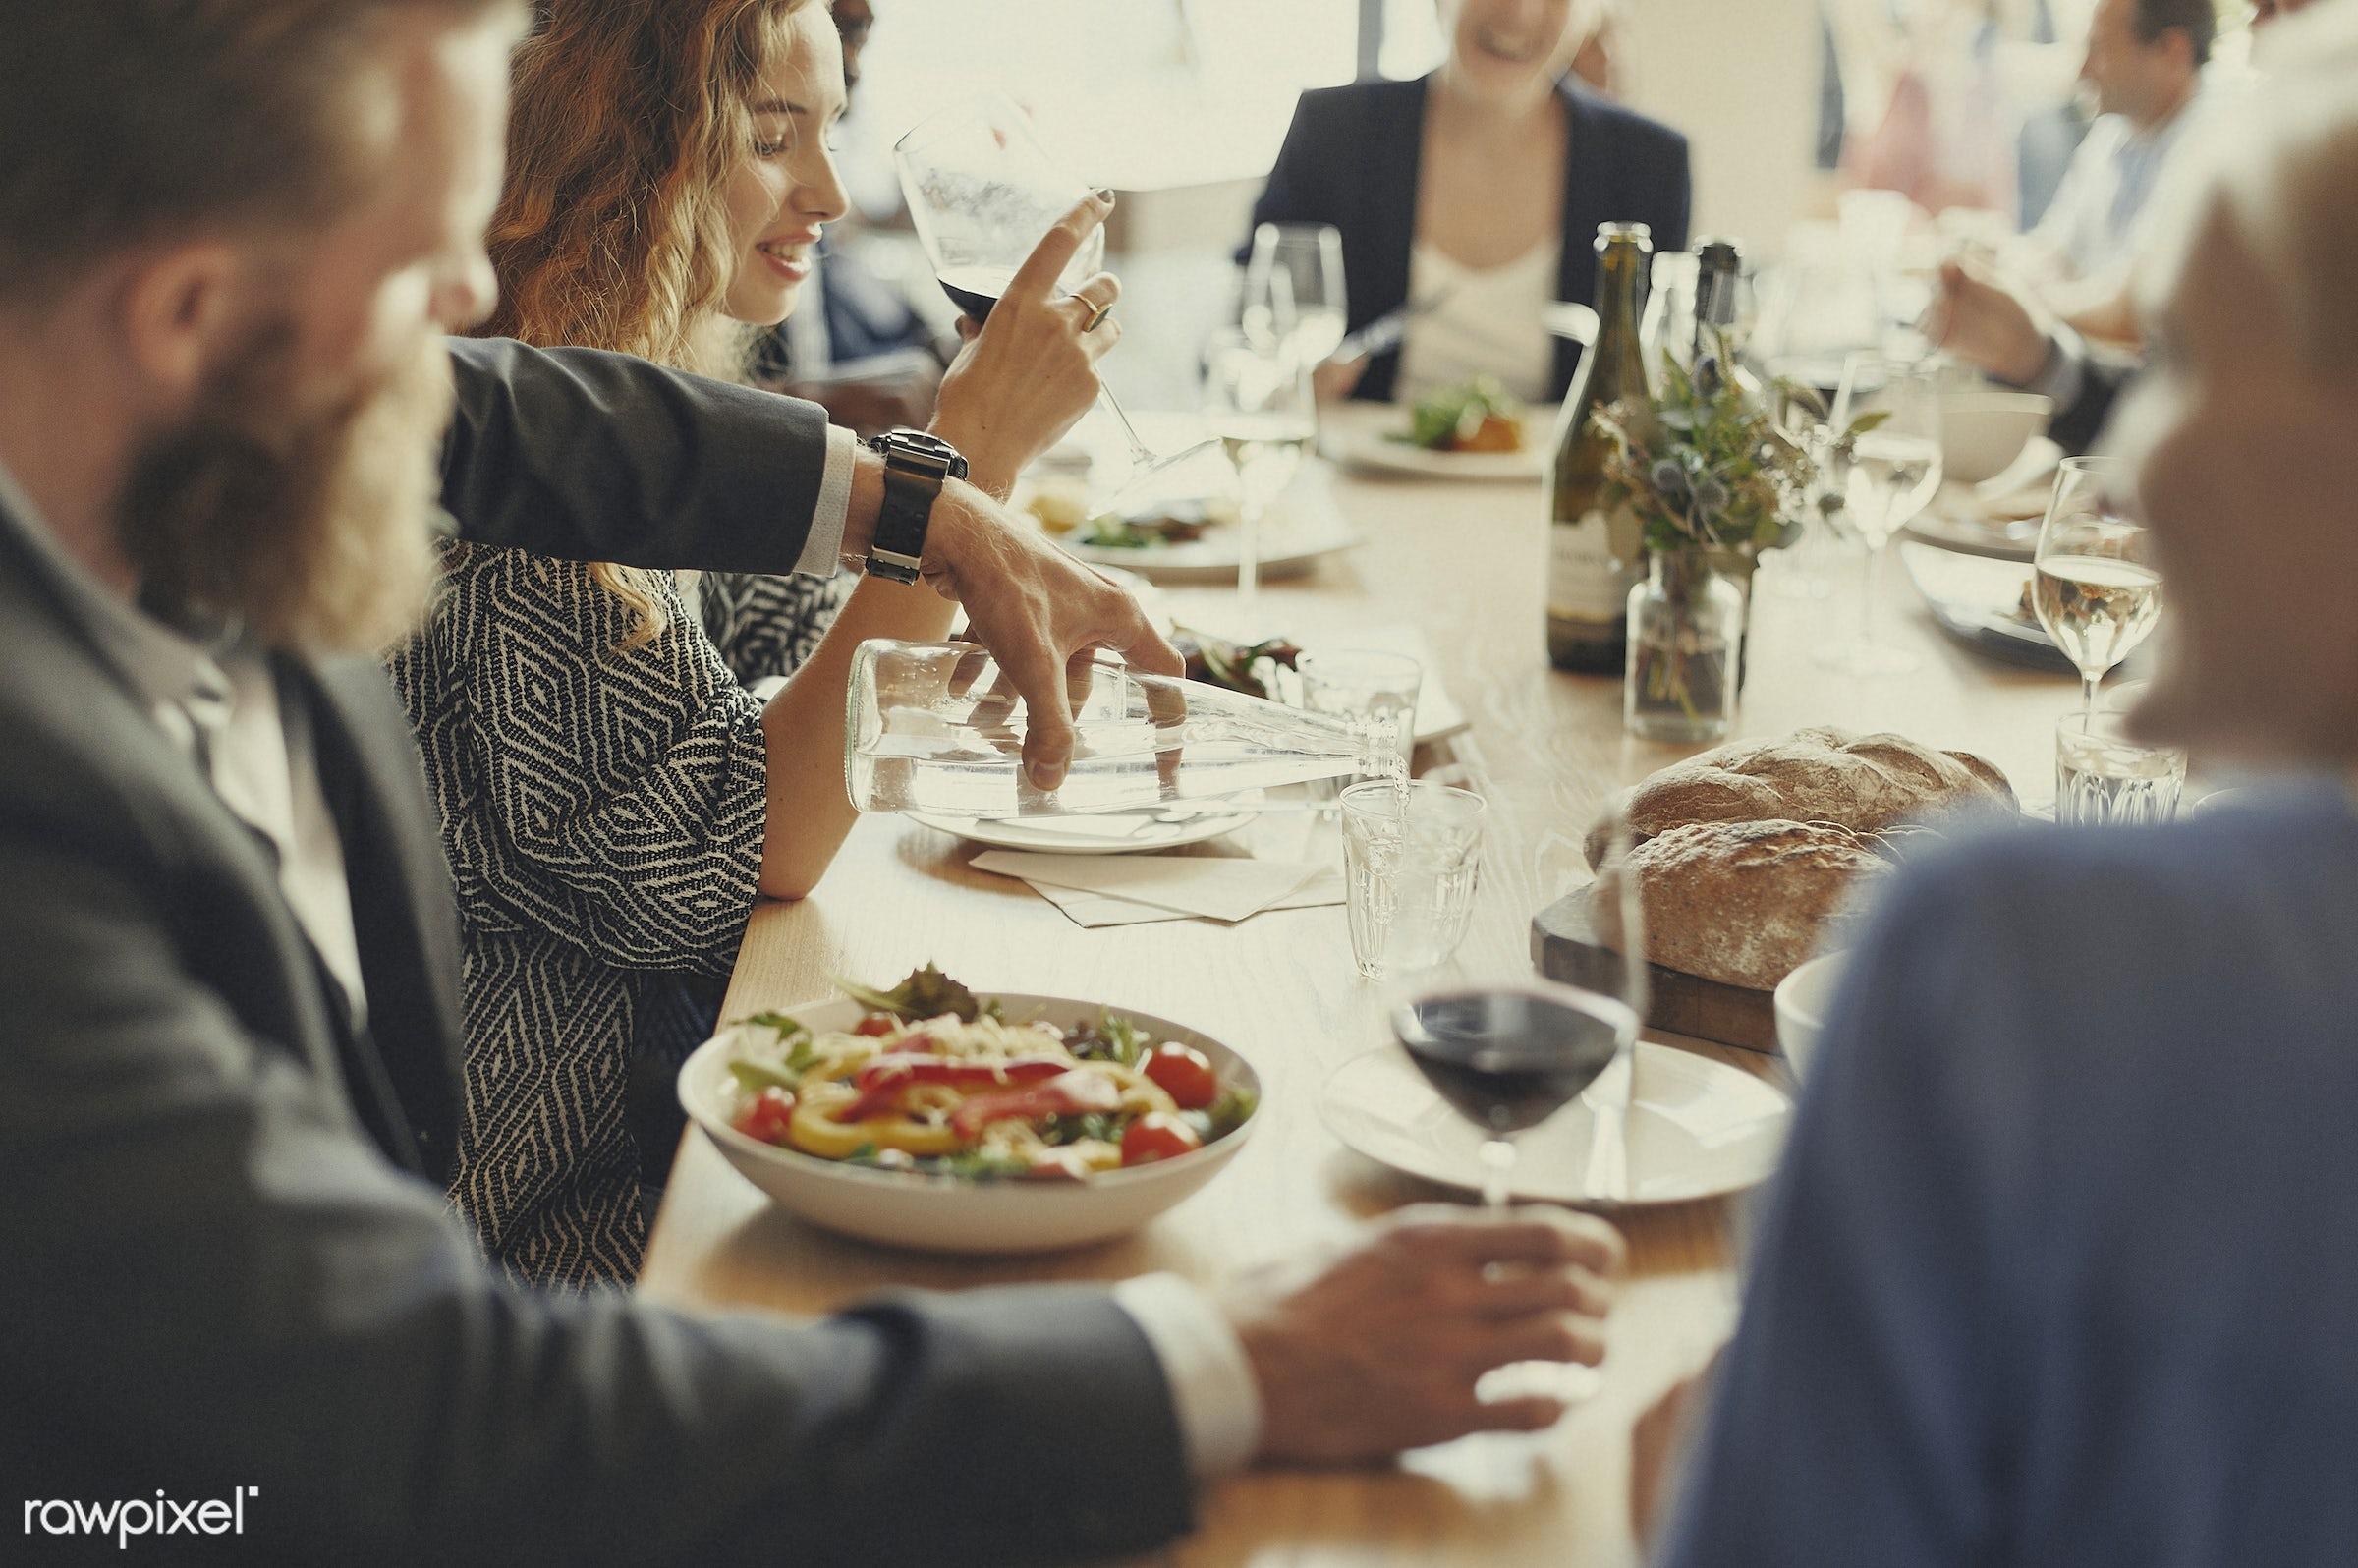 adult, banquet, break, brunch, buffet, business, business people, businesswoman, cafe, casual, catering, caucasian,...